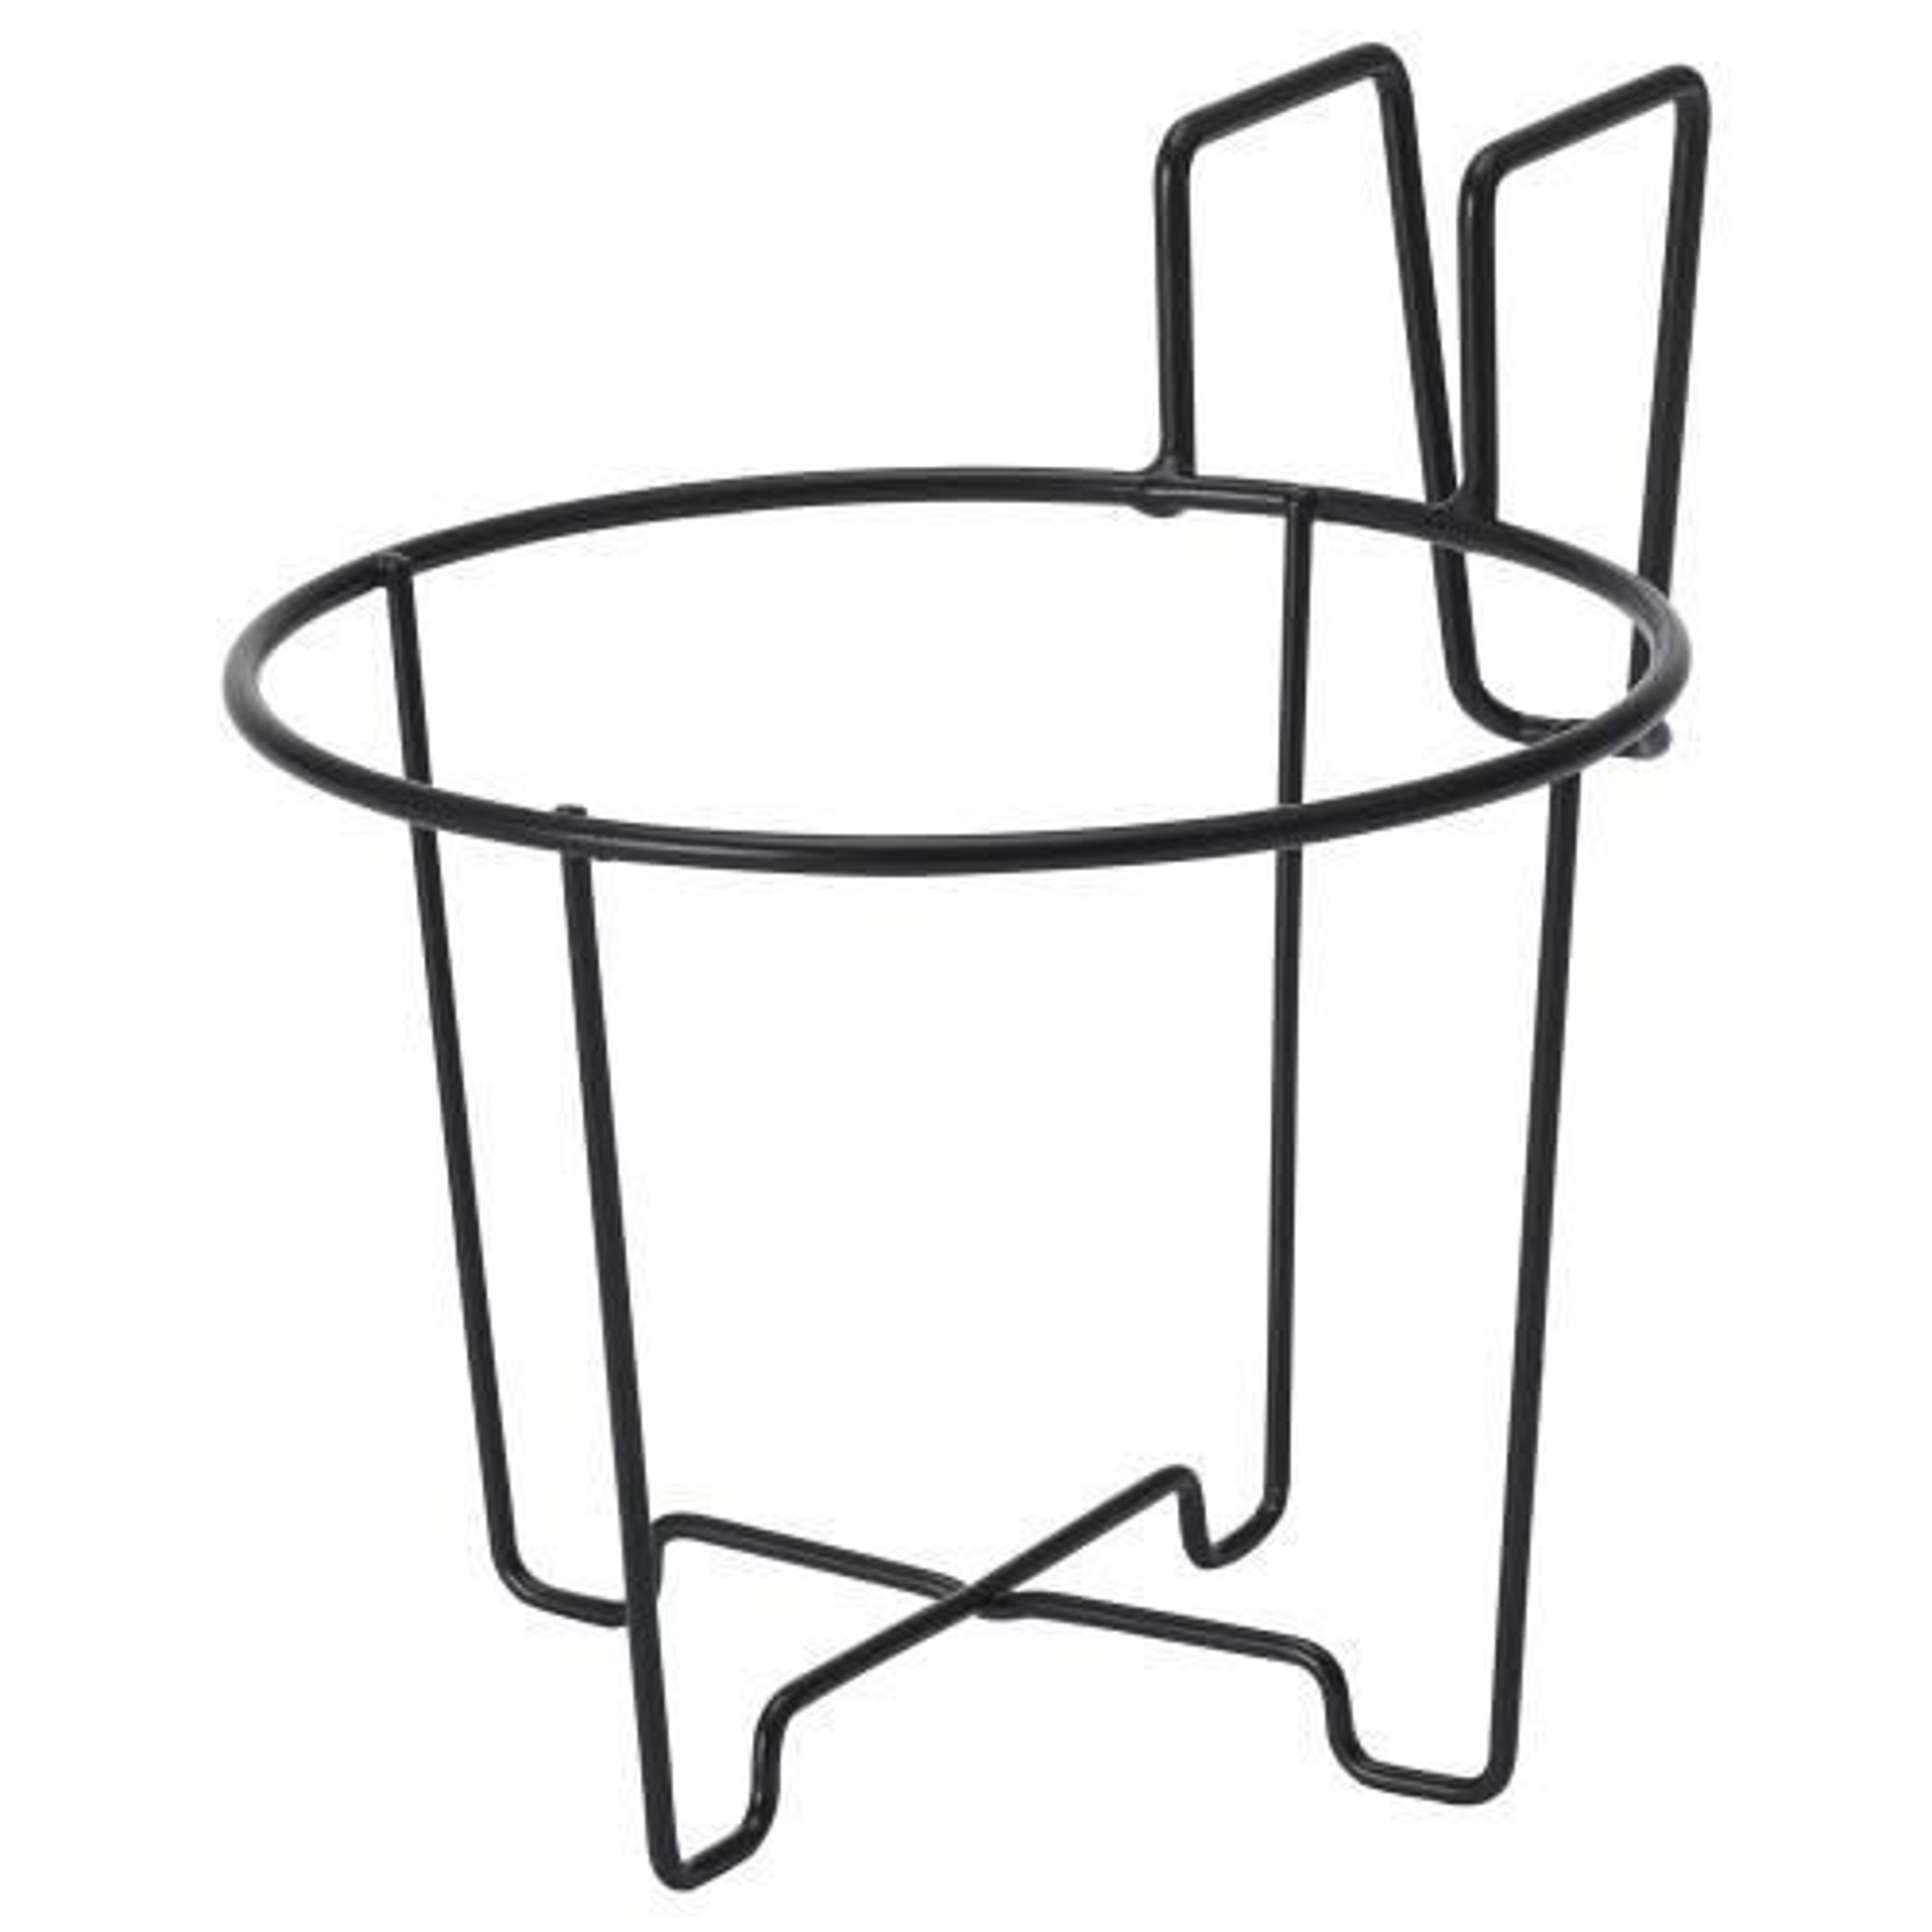 نگهدارنده گلدان ایکیا مدل SOMMAR 2018 کد 85-906-603